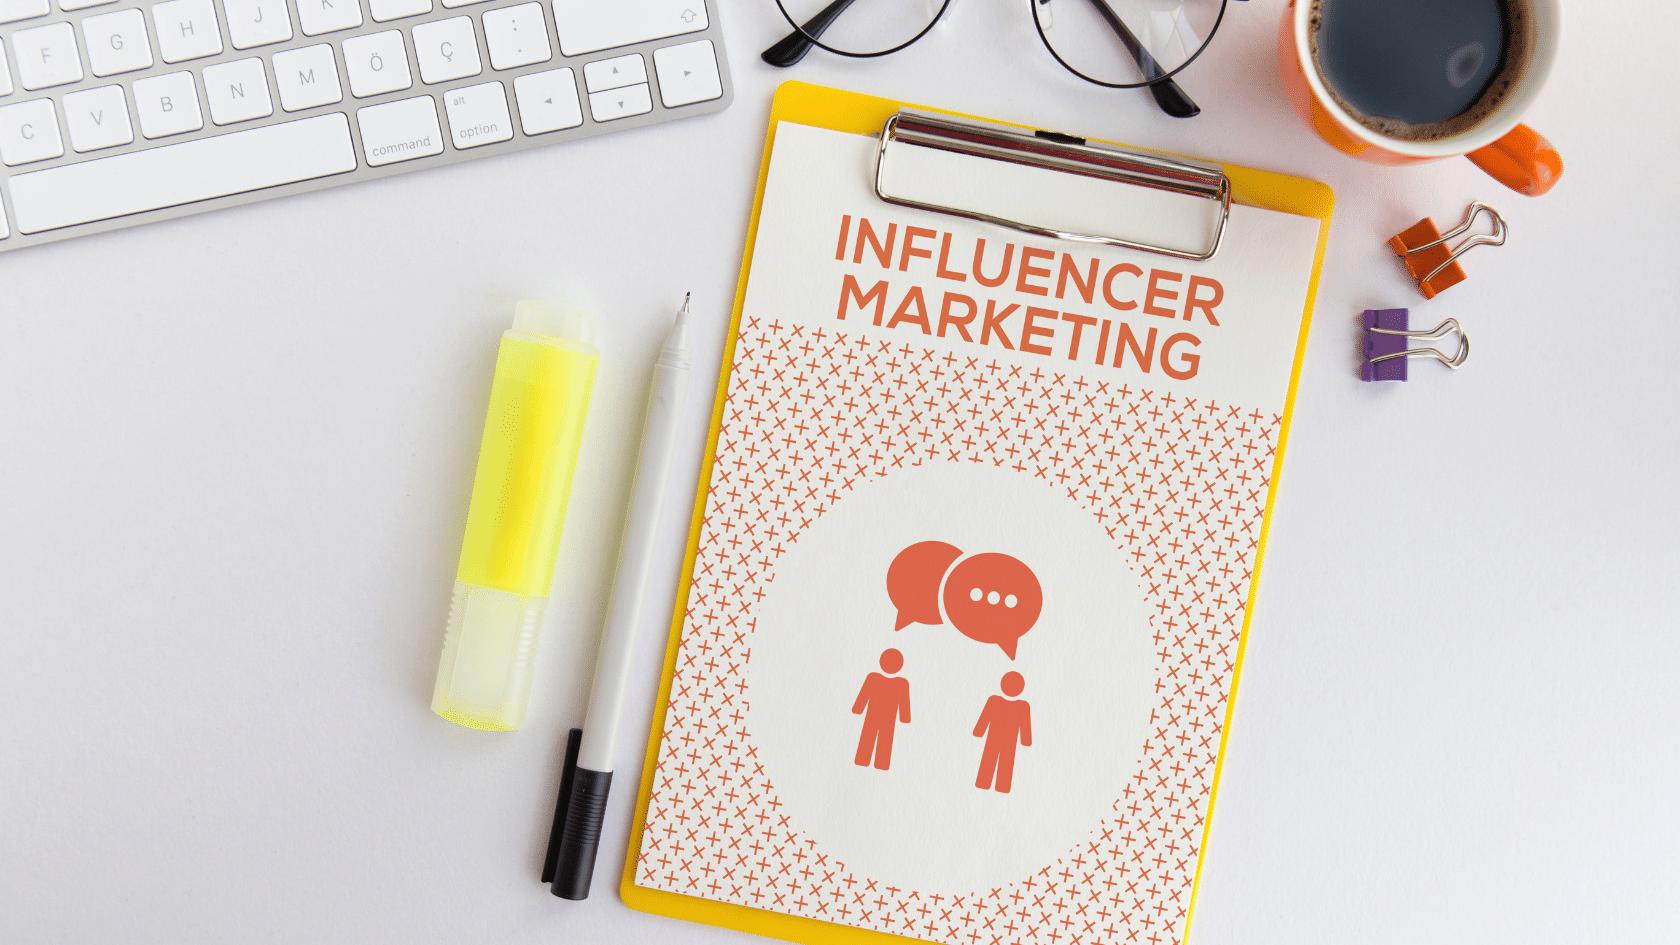 incluencer marketing strats